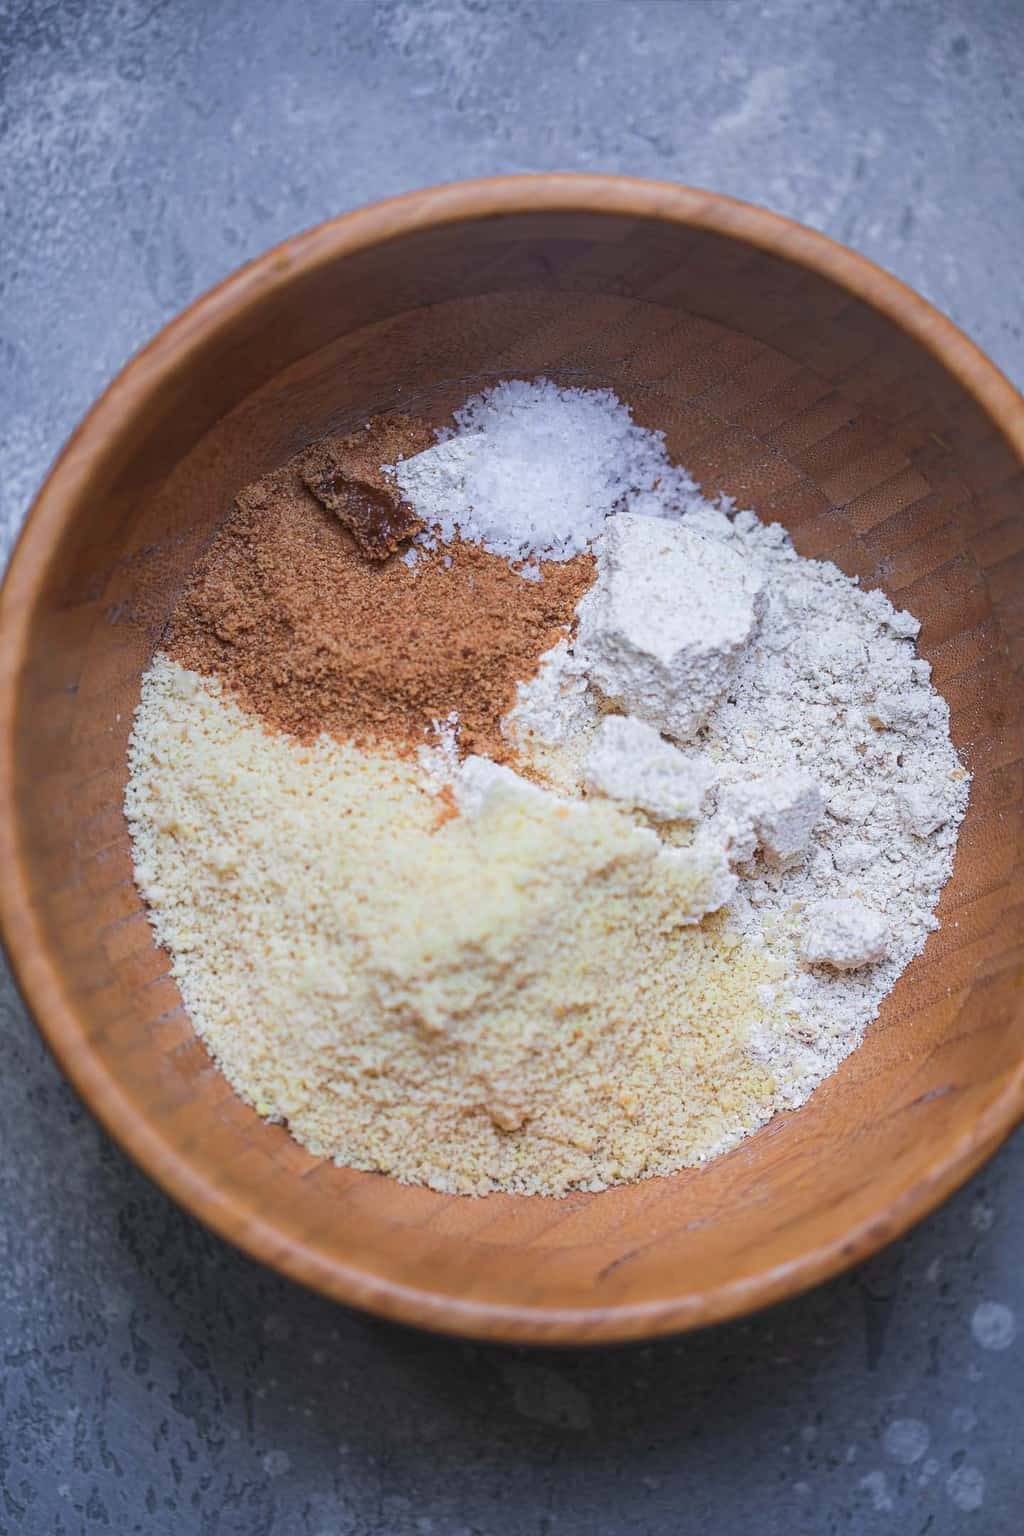 Cookie dough dry ingredients